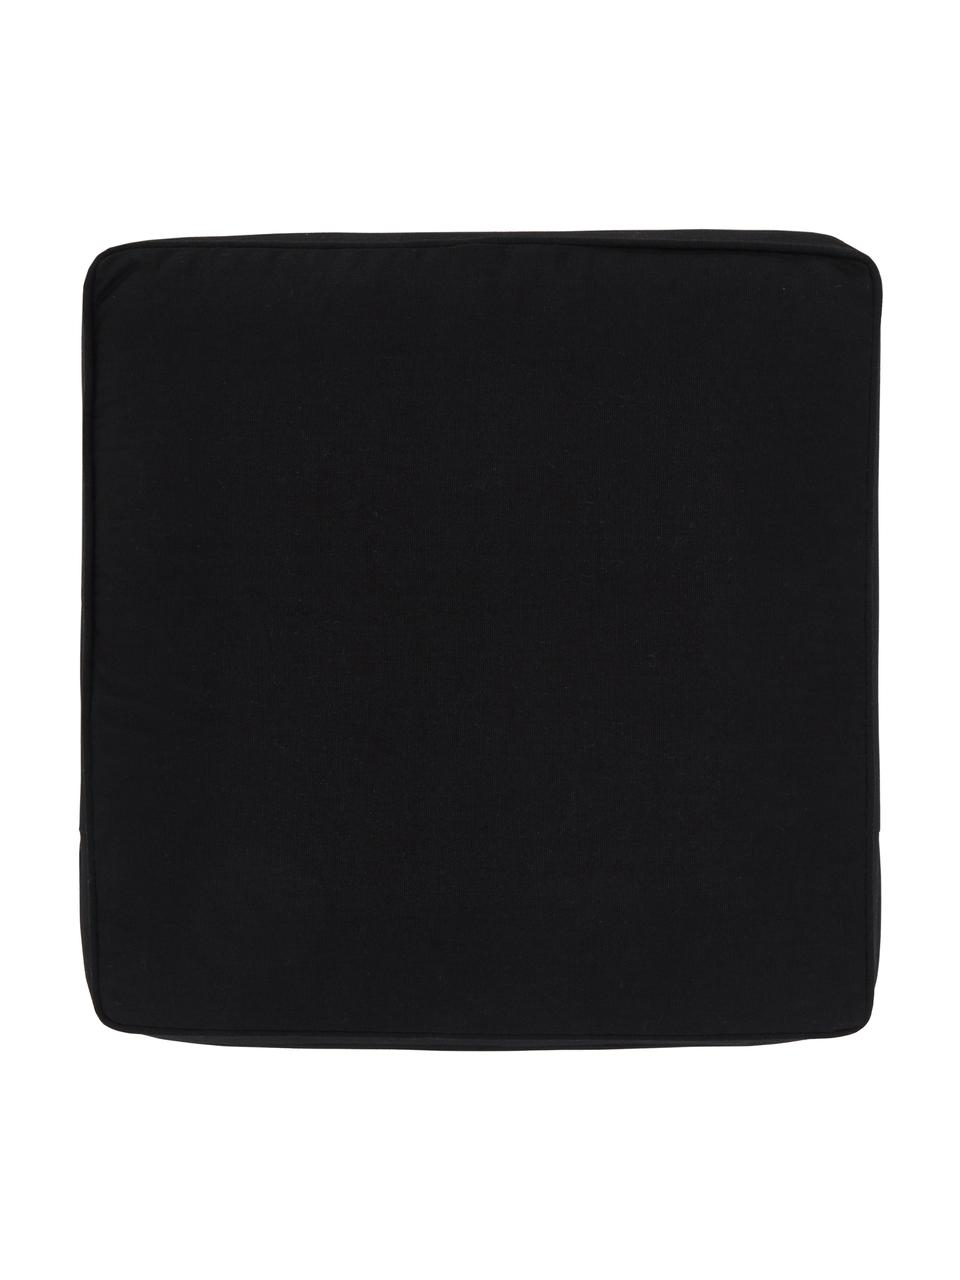 Stoelkussen Zoey in zwart, Zwart, 40 x 40 cm